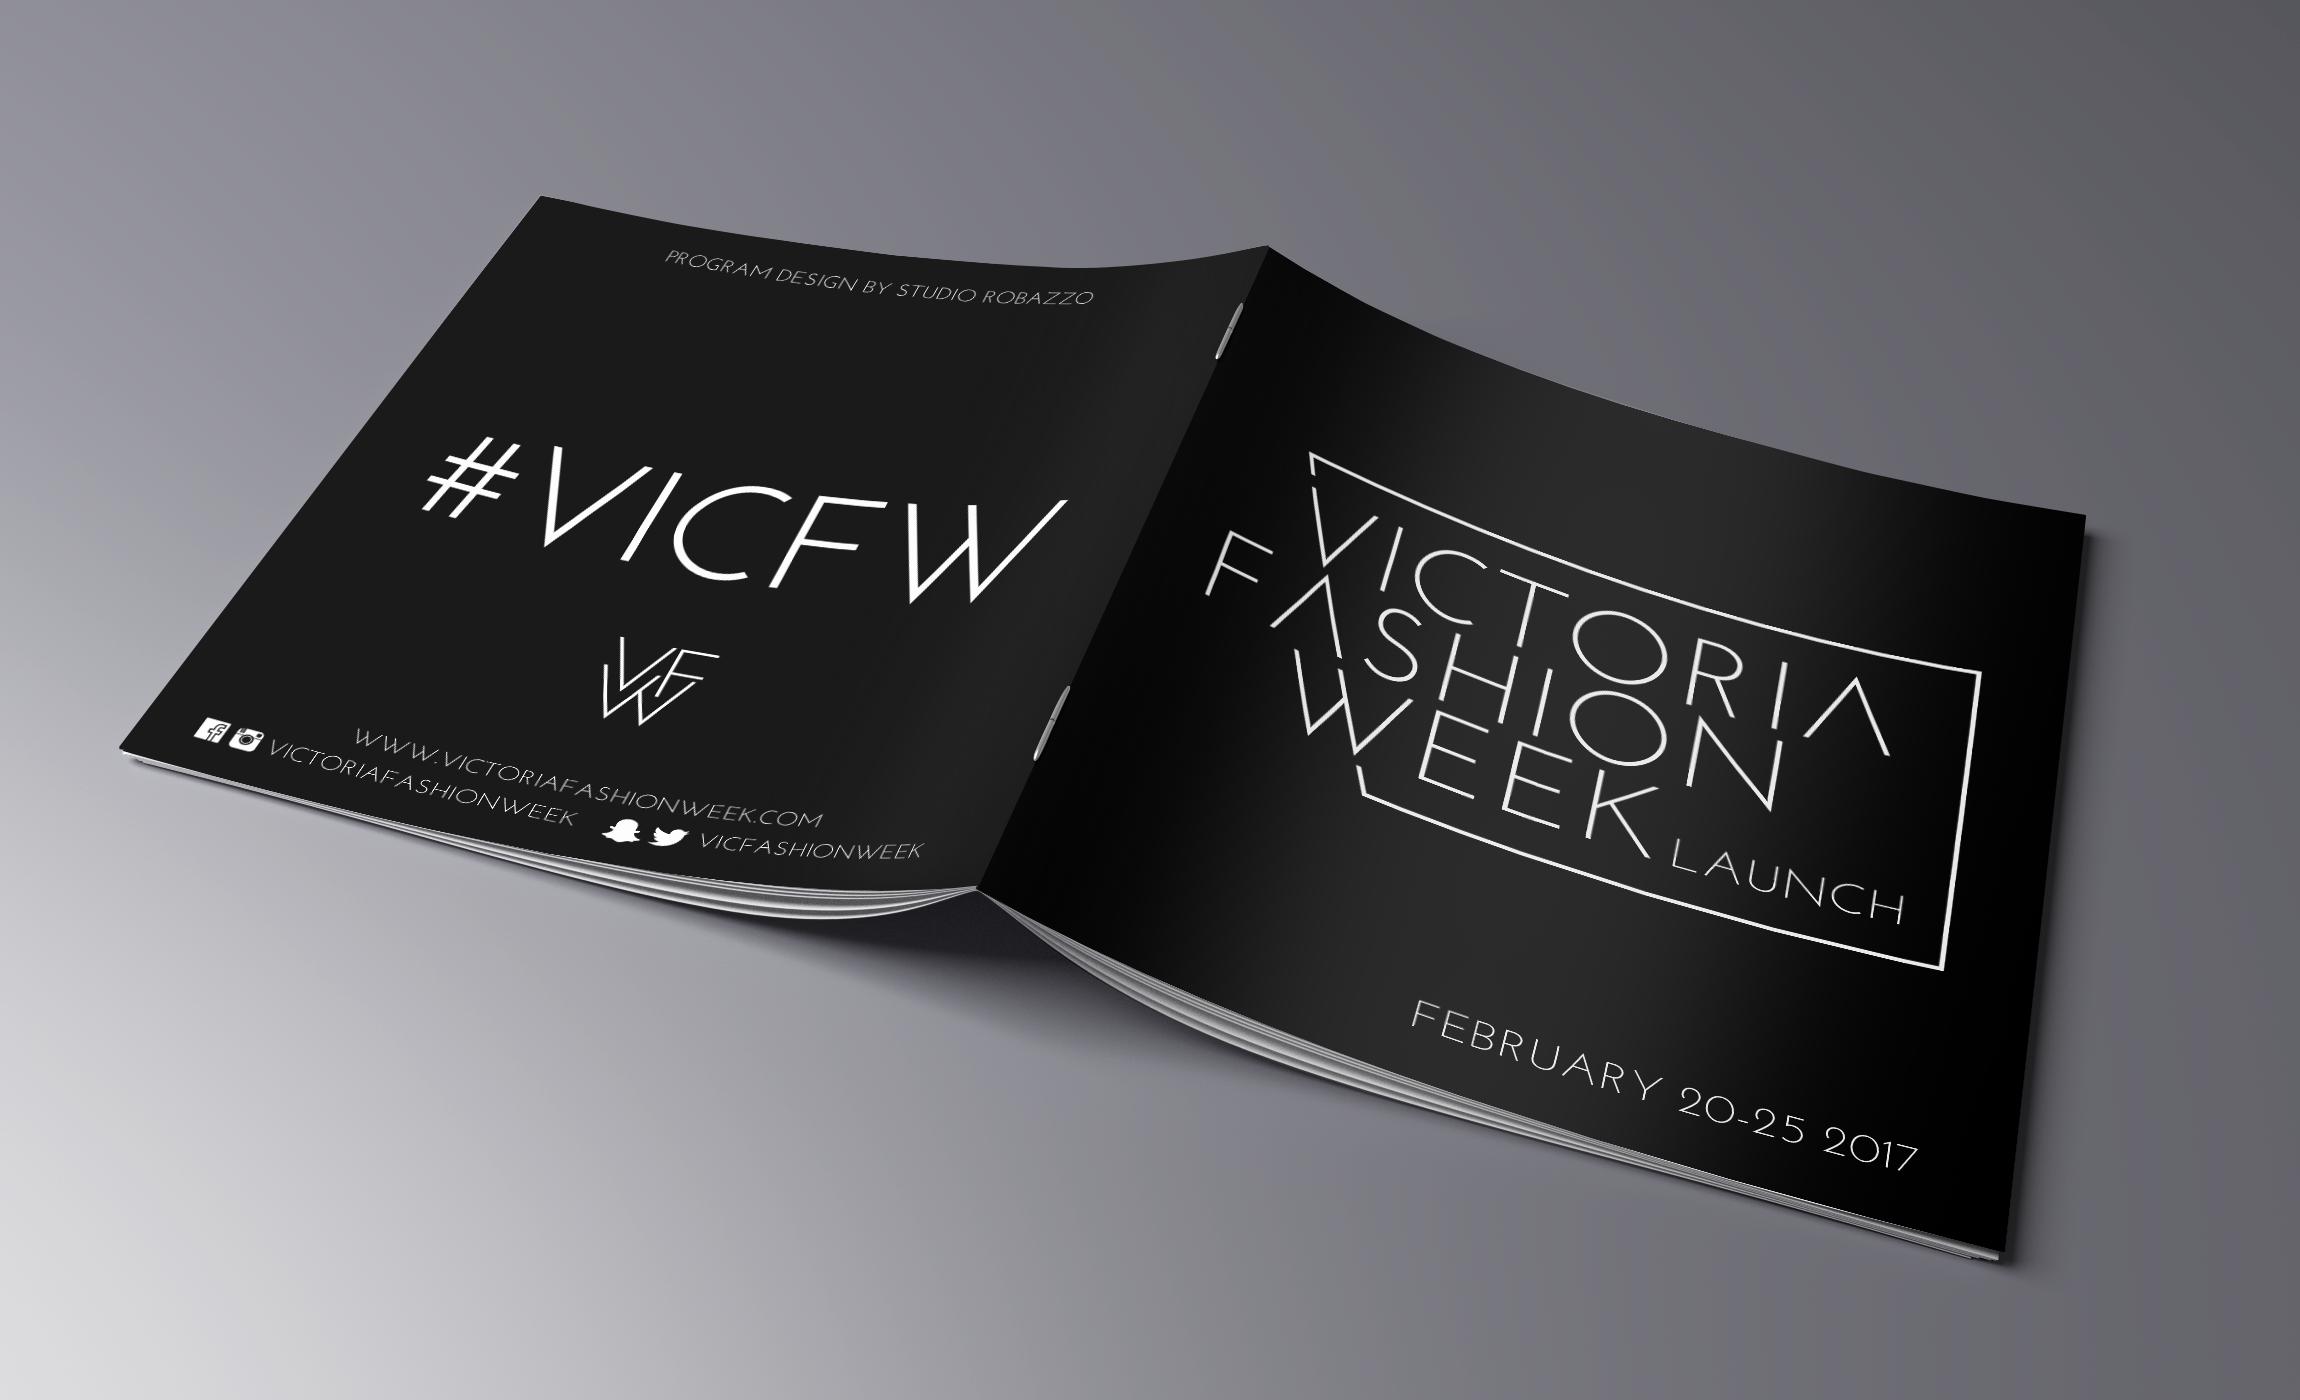 VFWBooklet_frontbackcover_spread.png